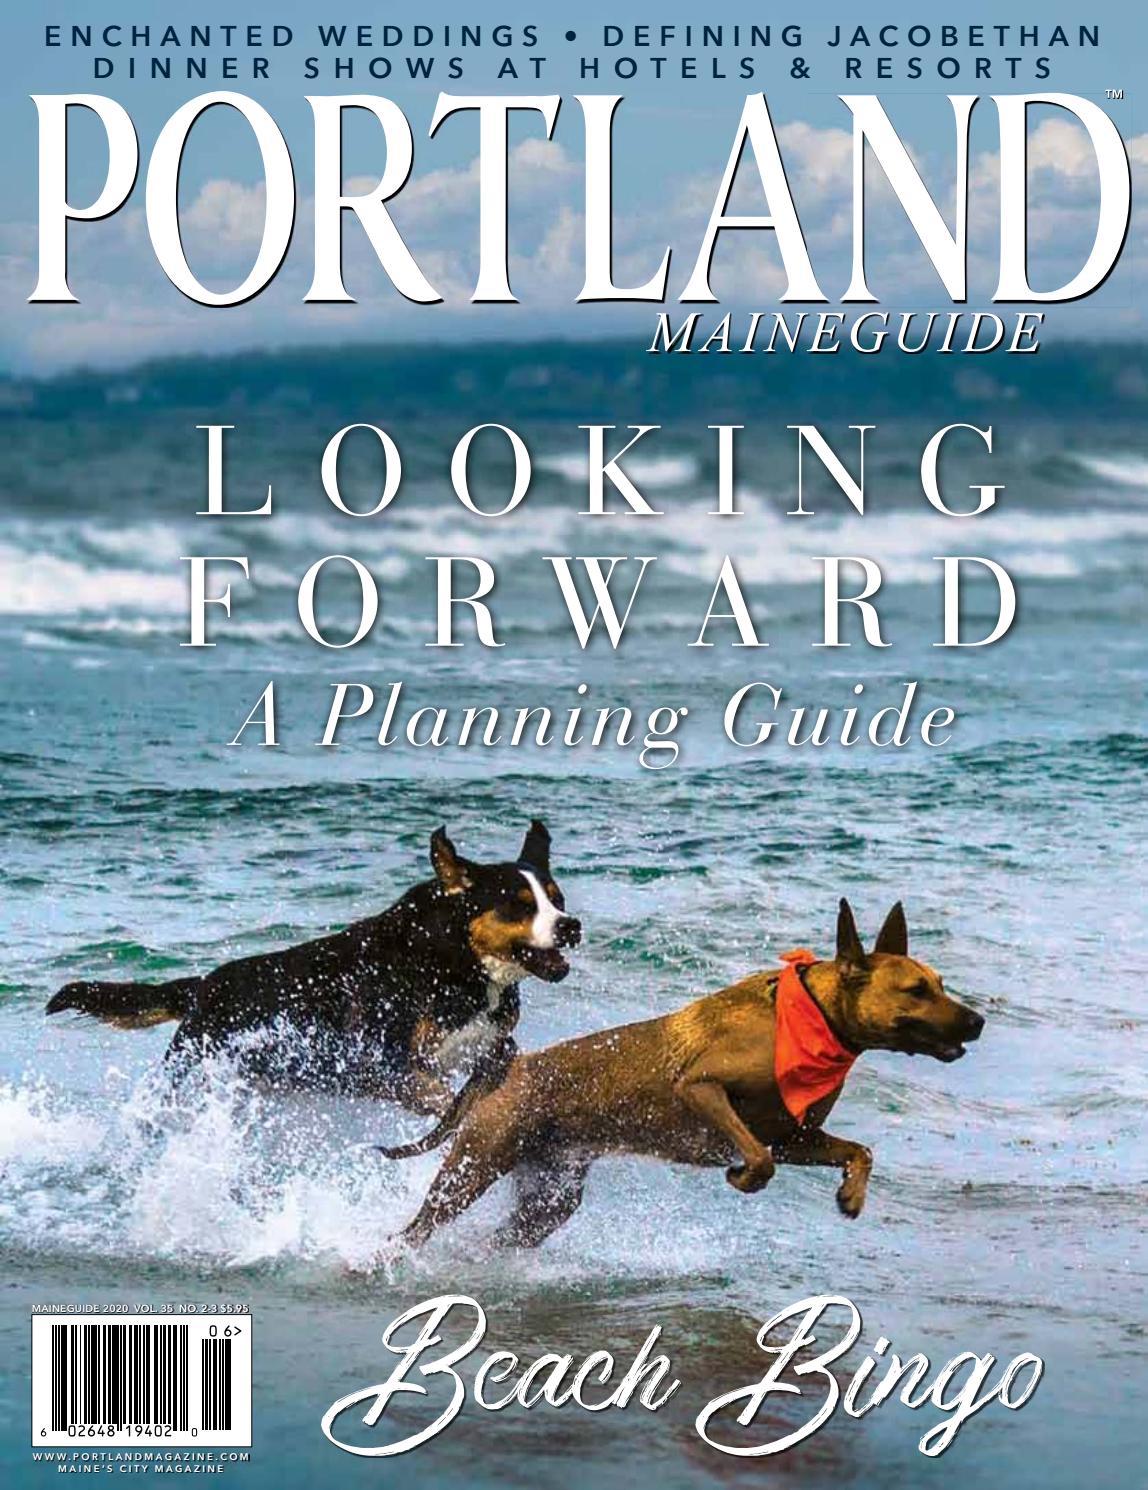 Portland Monthly Magazine May 2016 Issue (Best Bars) | eBay